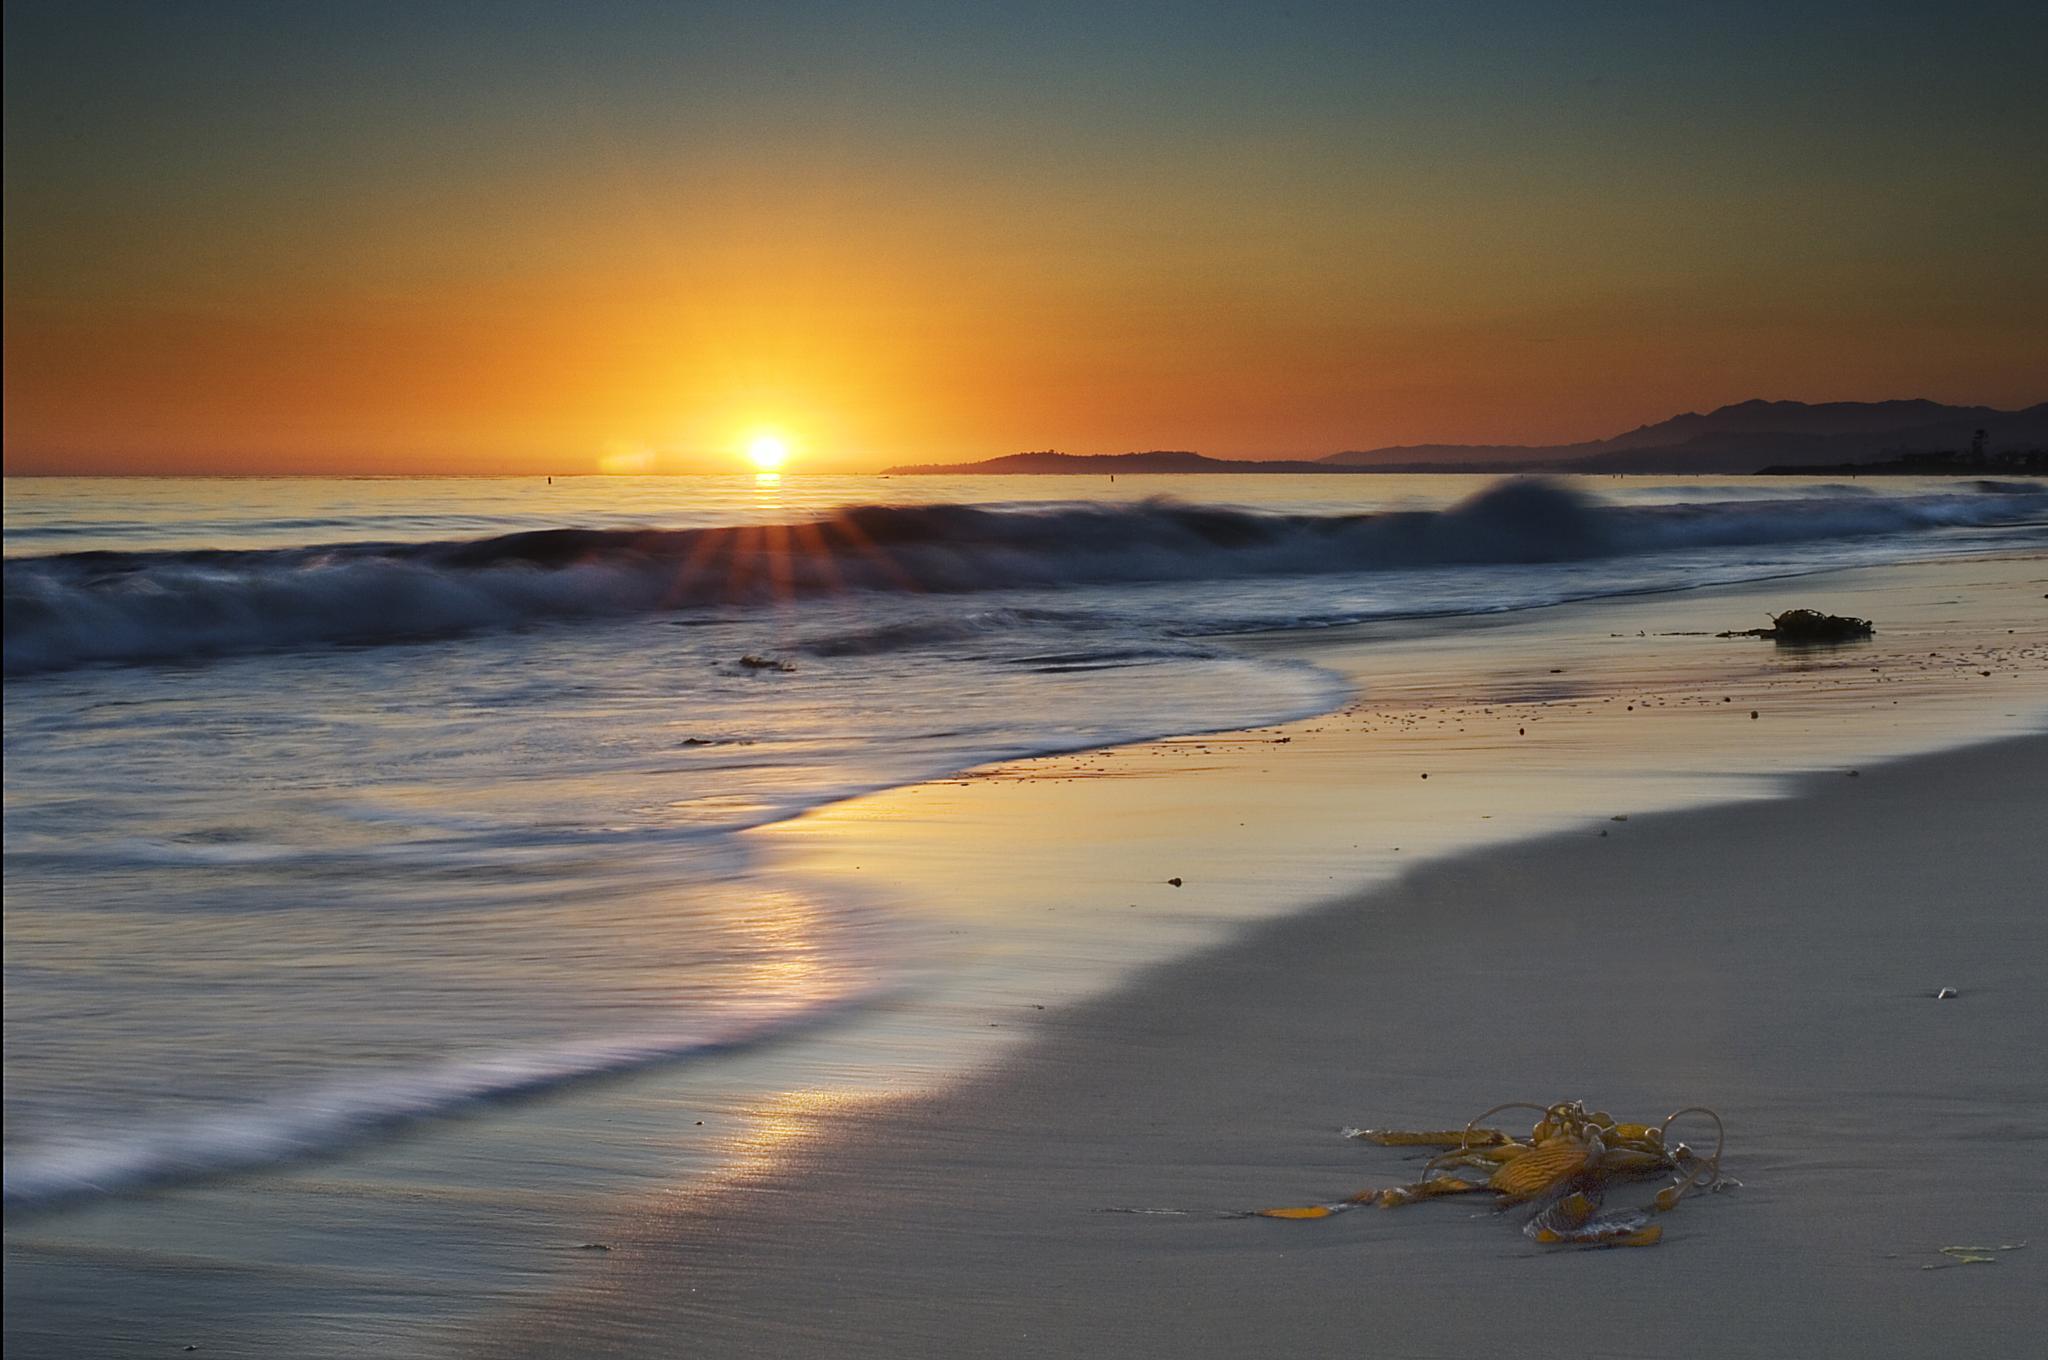 Carpentiera Sunset by Stormrider-uk